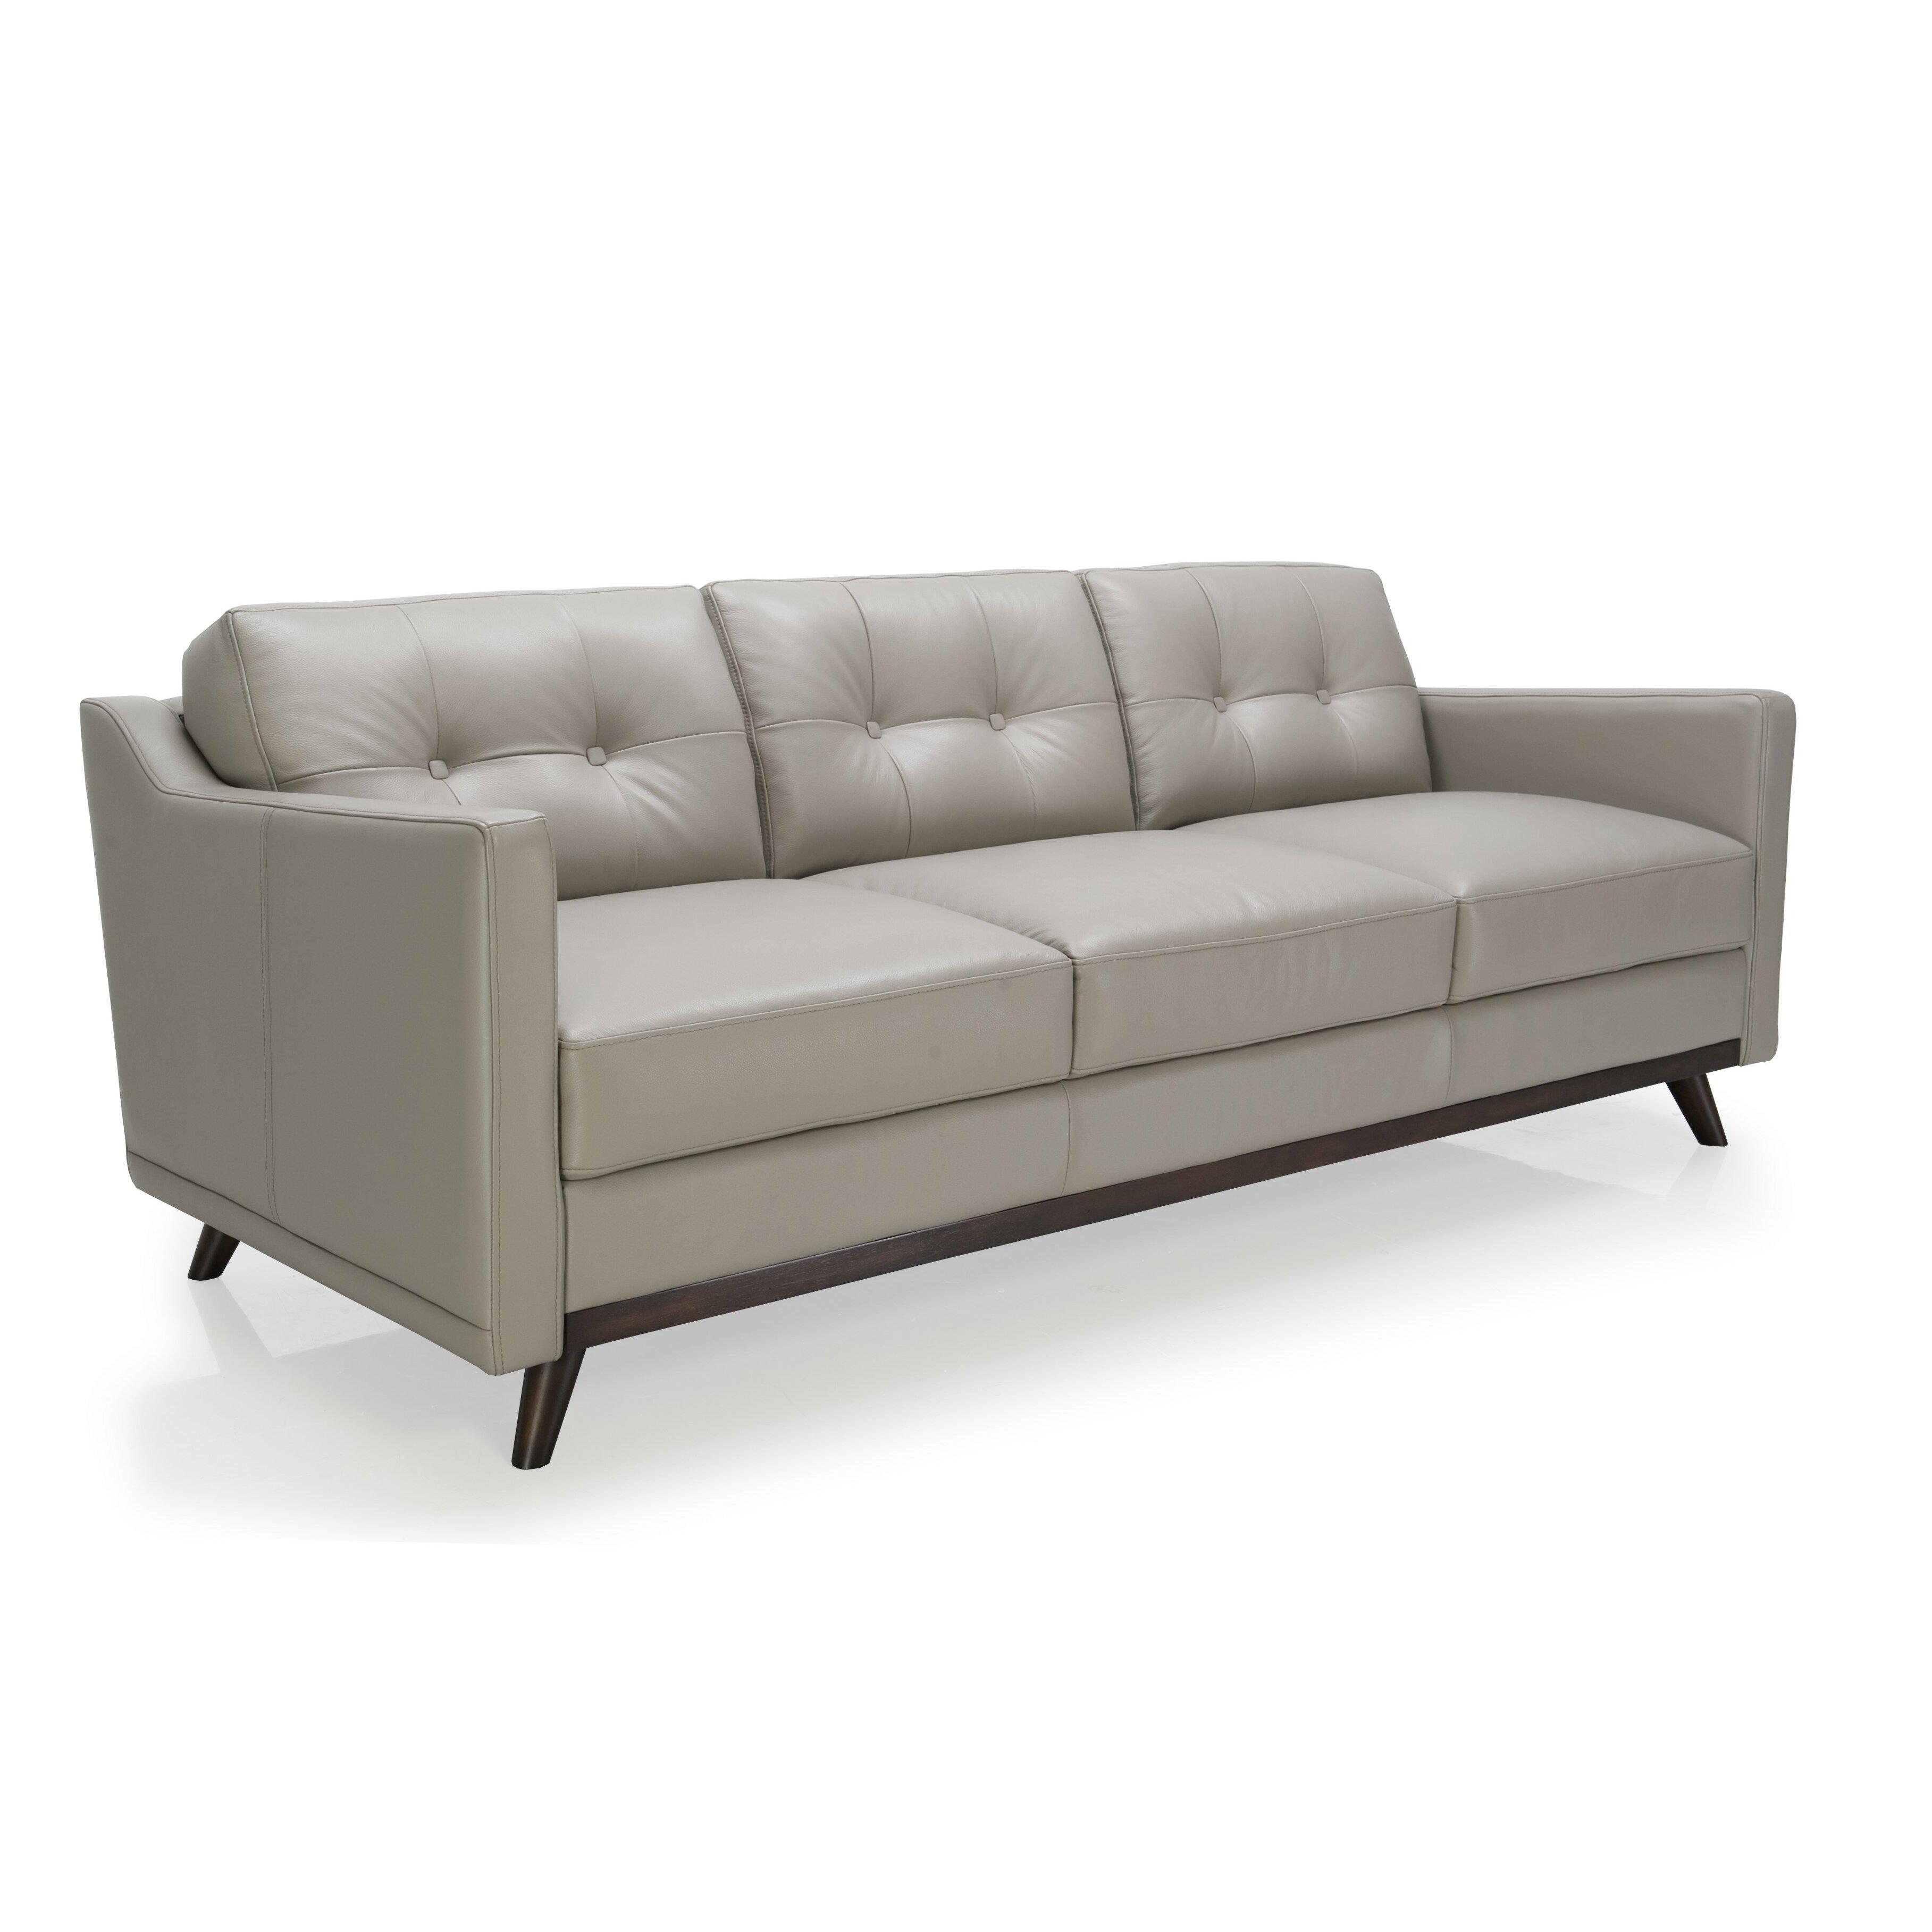 moroni monika full top grain leather sofa wayfair. Black Bedroom Furniture Sets. Home Design Ideas